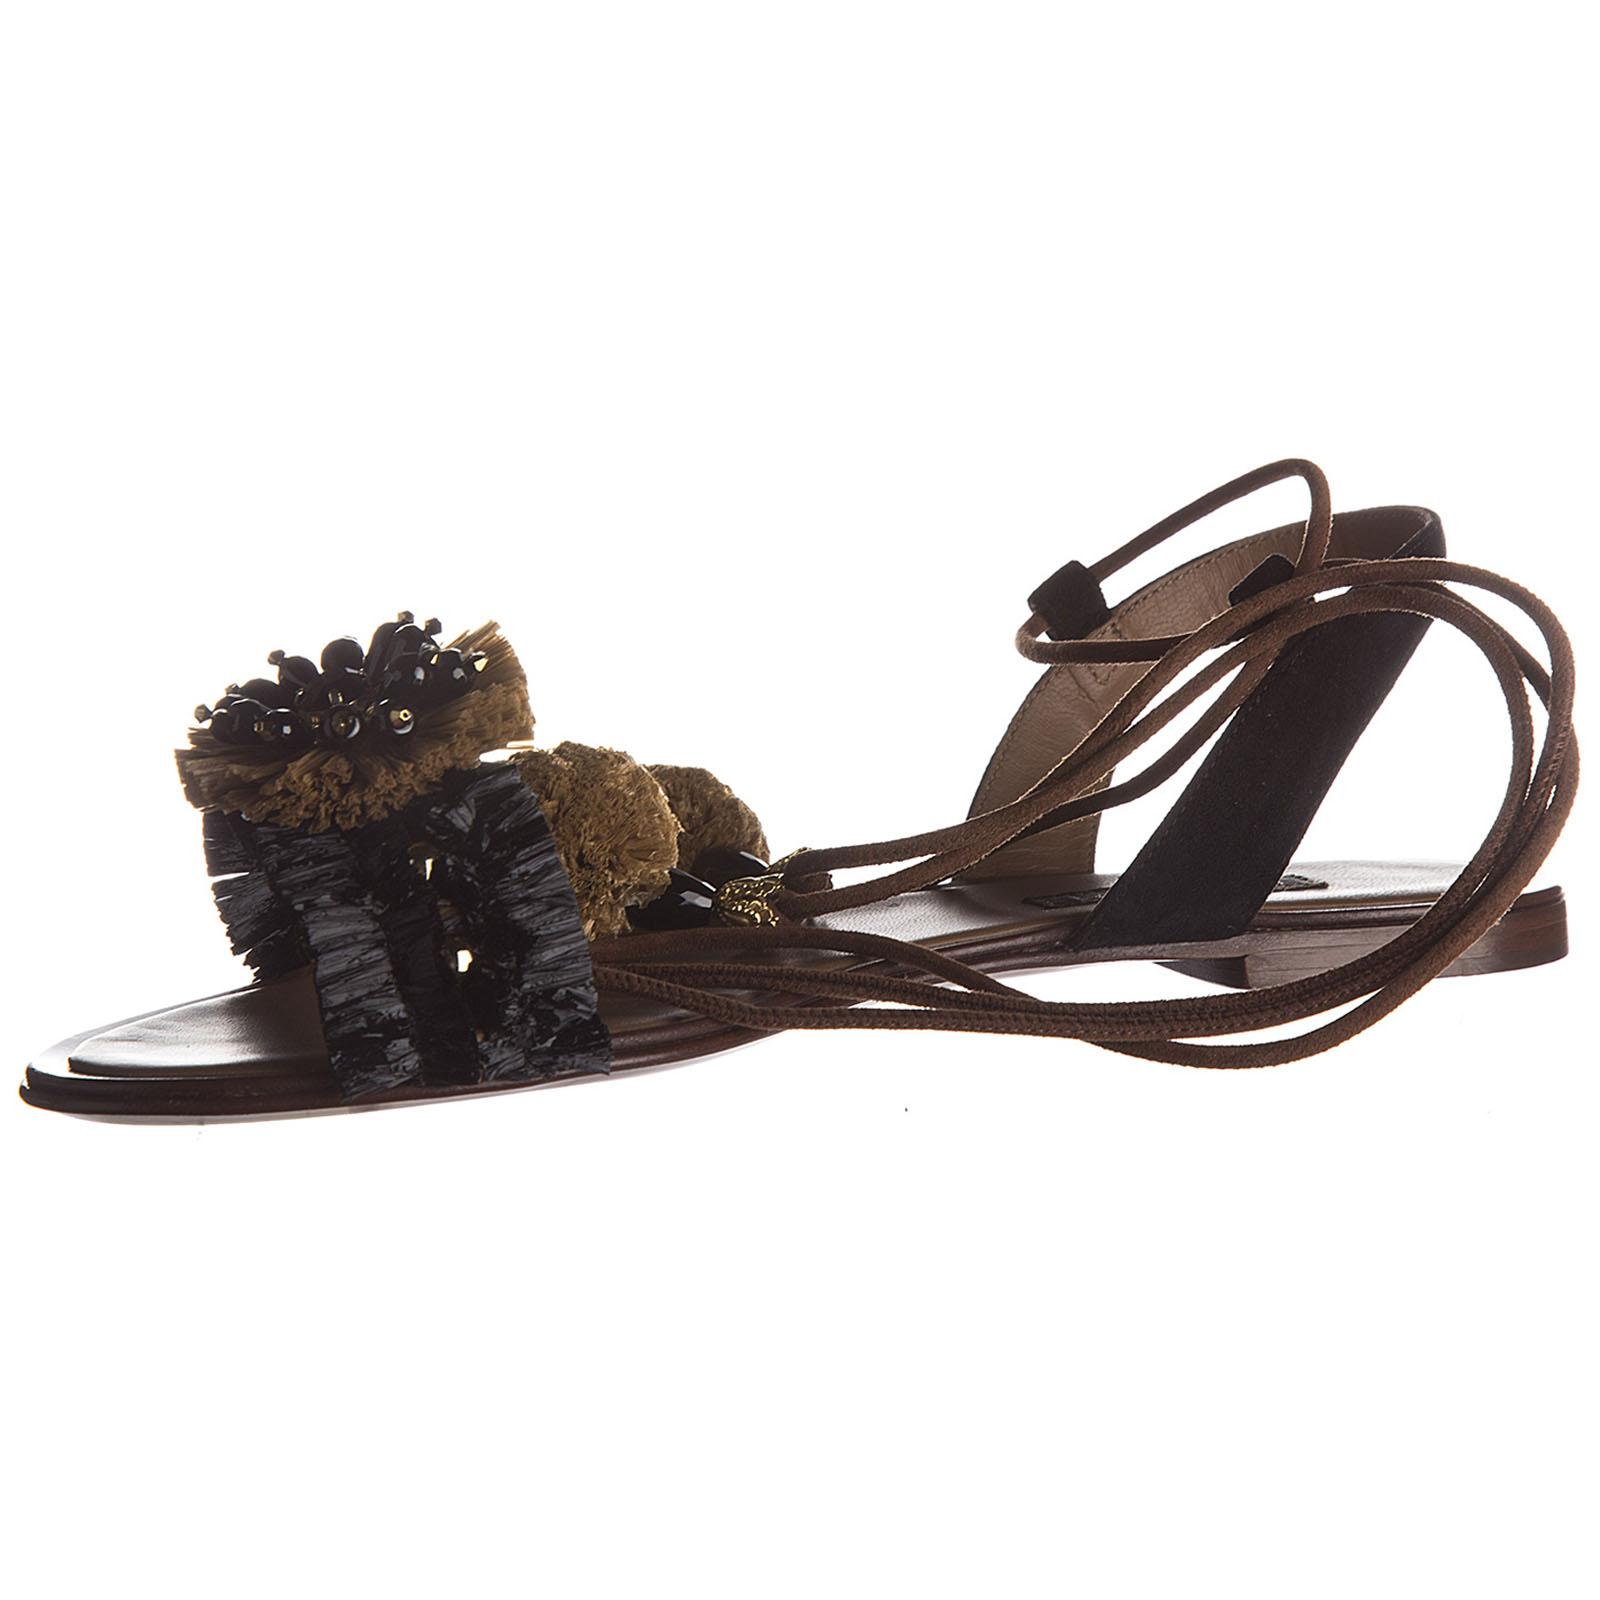 сандалии женские кожаные